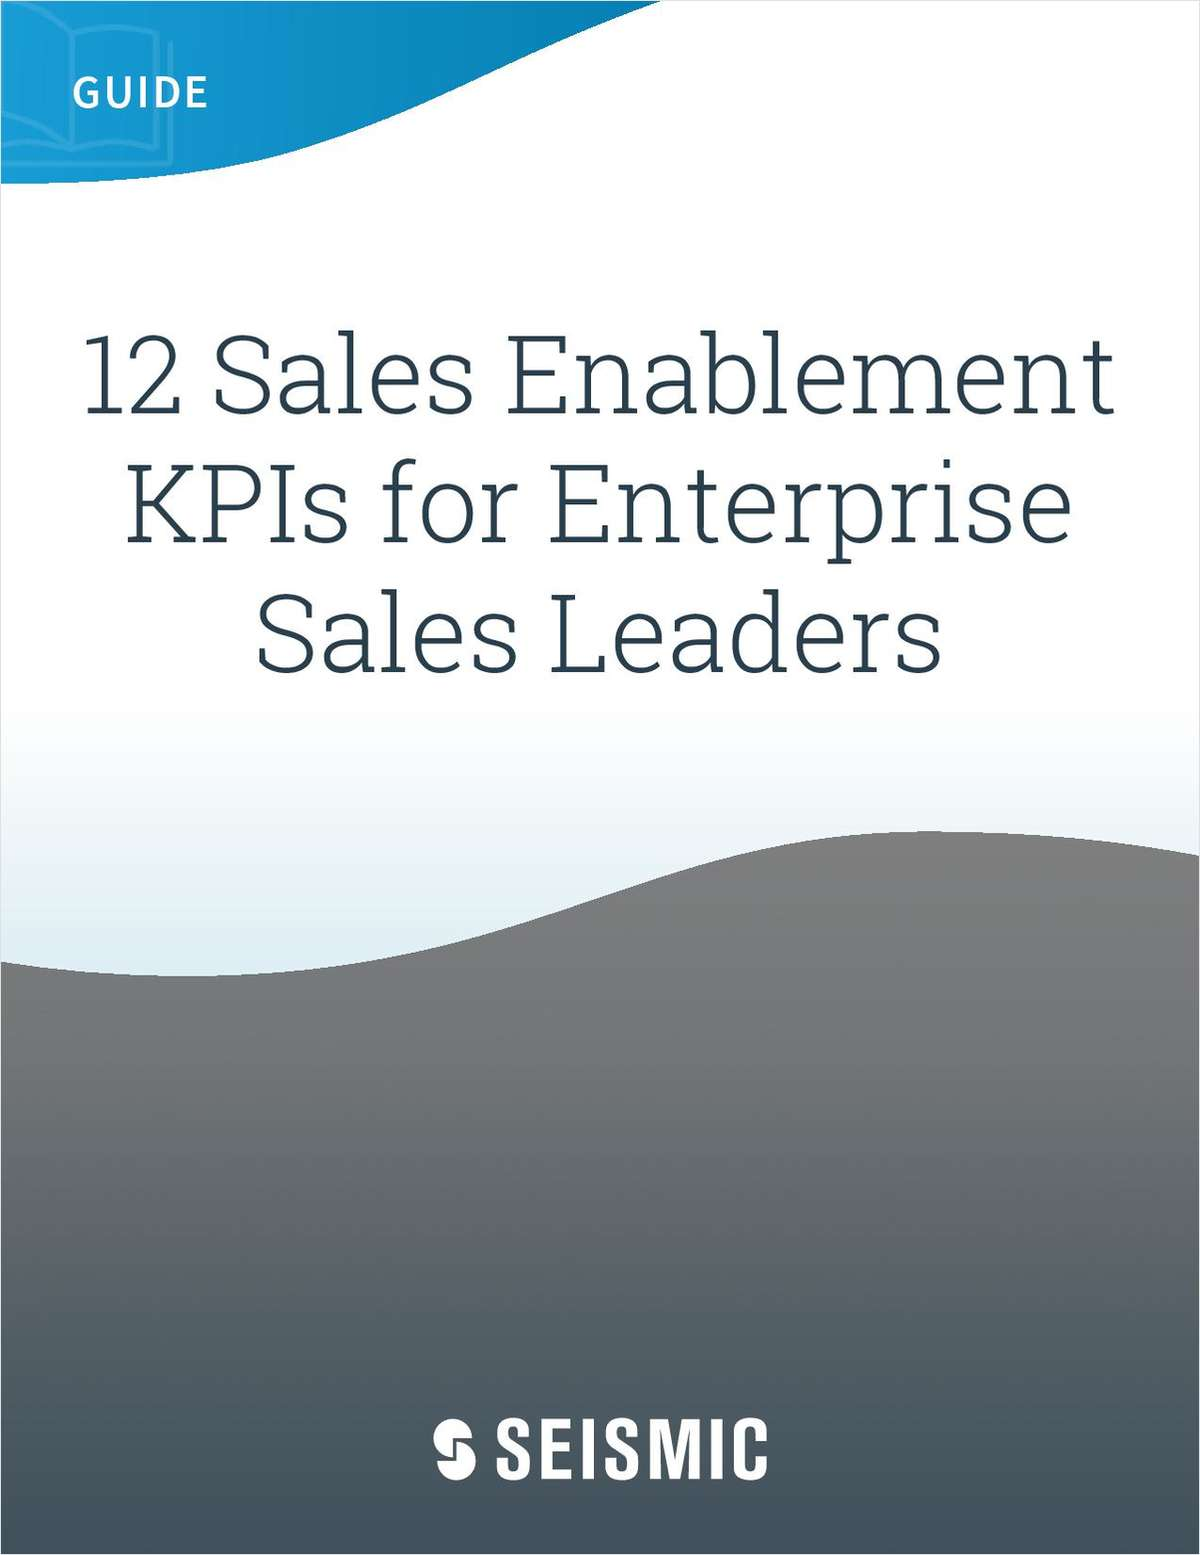 12 Sales Enablement KPIs for Enterprise Sales Leaders